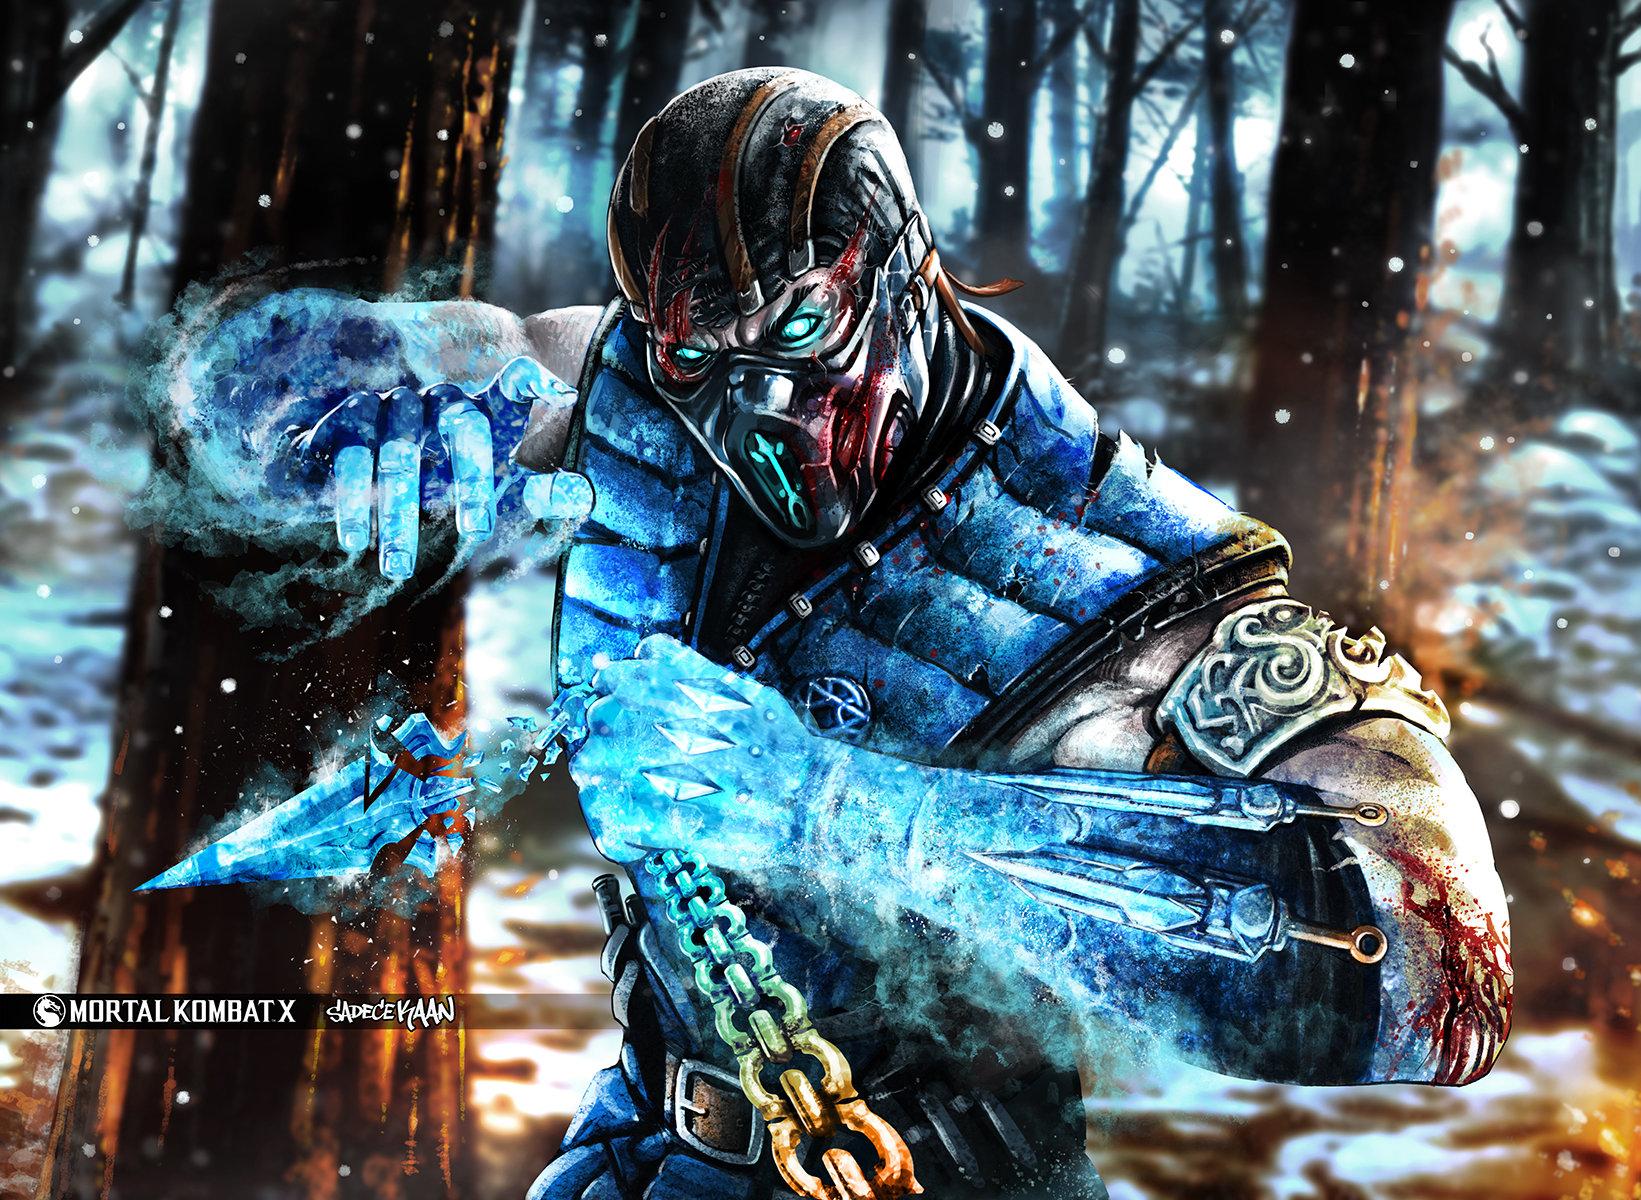 Artstation Scorpion Sub Zero Mortal Kombat X Sadece Kaan